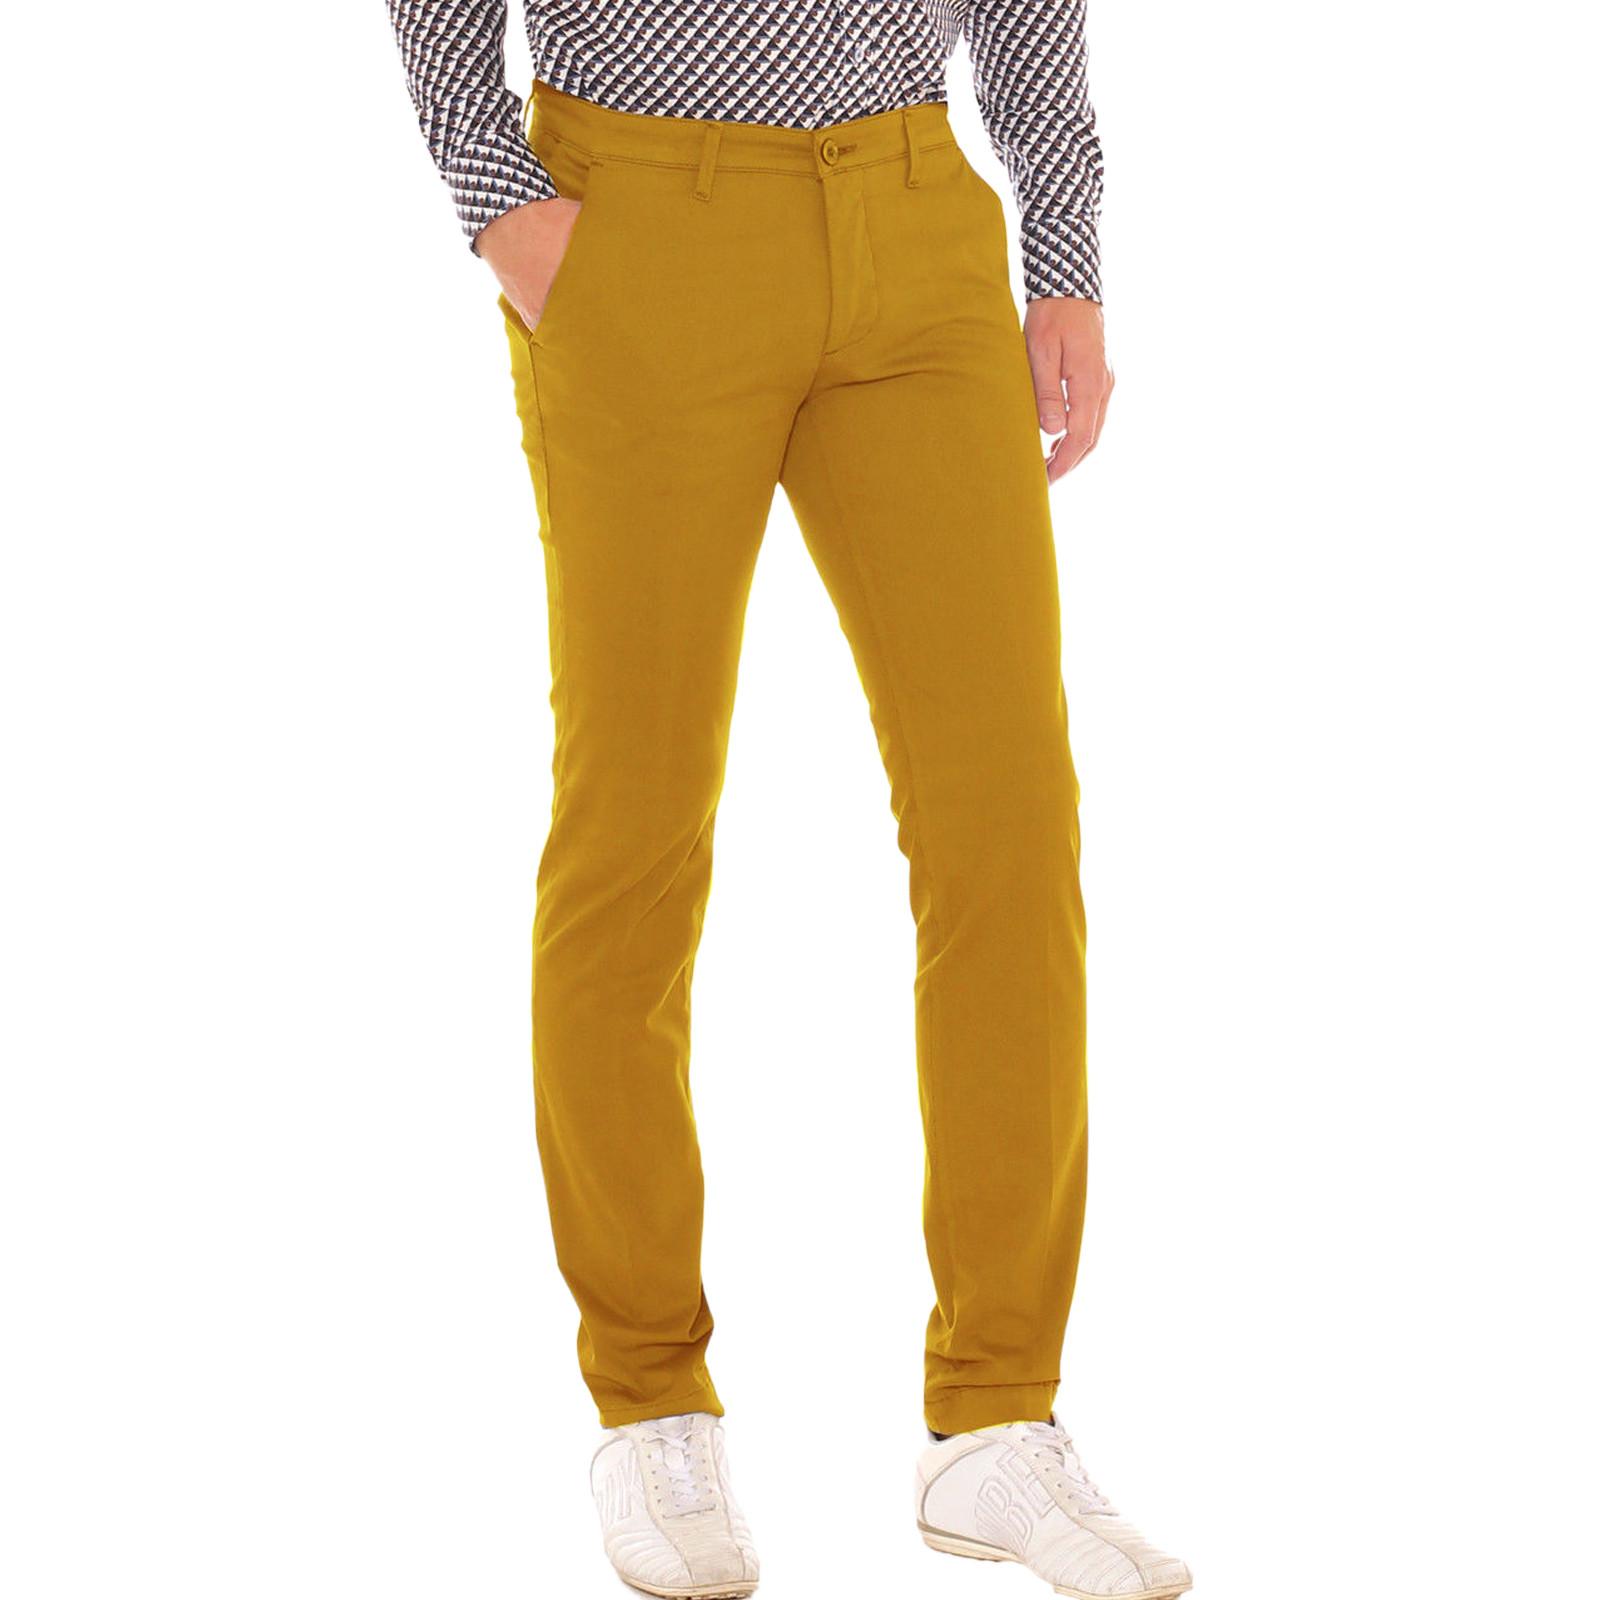 Pantalone-Uomo-Slim-fit-Chino-Elegante-Invernale-America-Cotone-Tasca-america miniatura 29